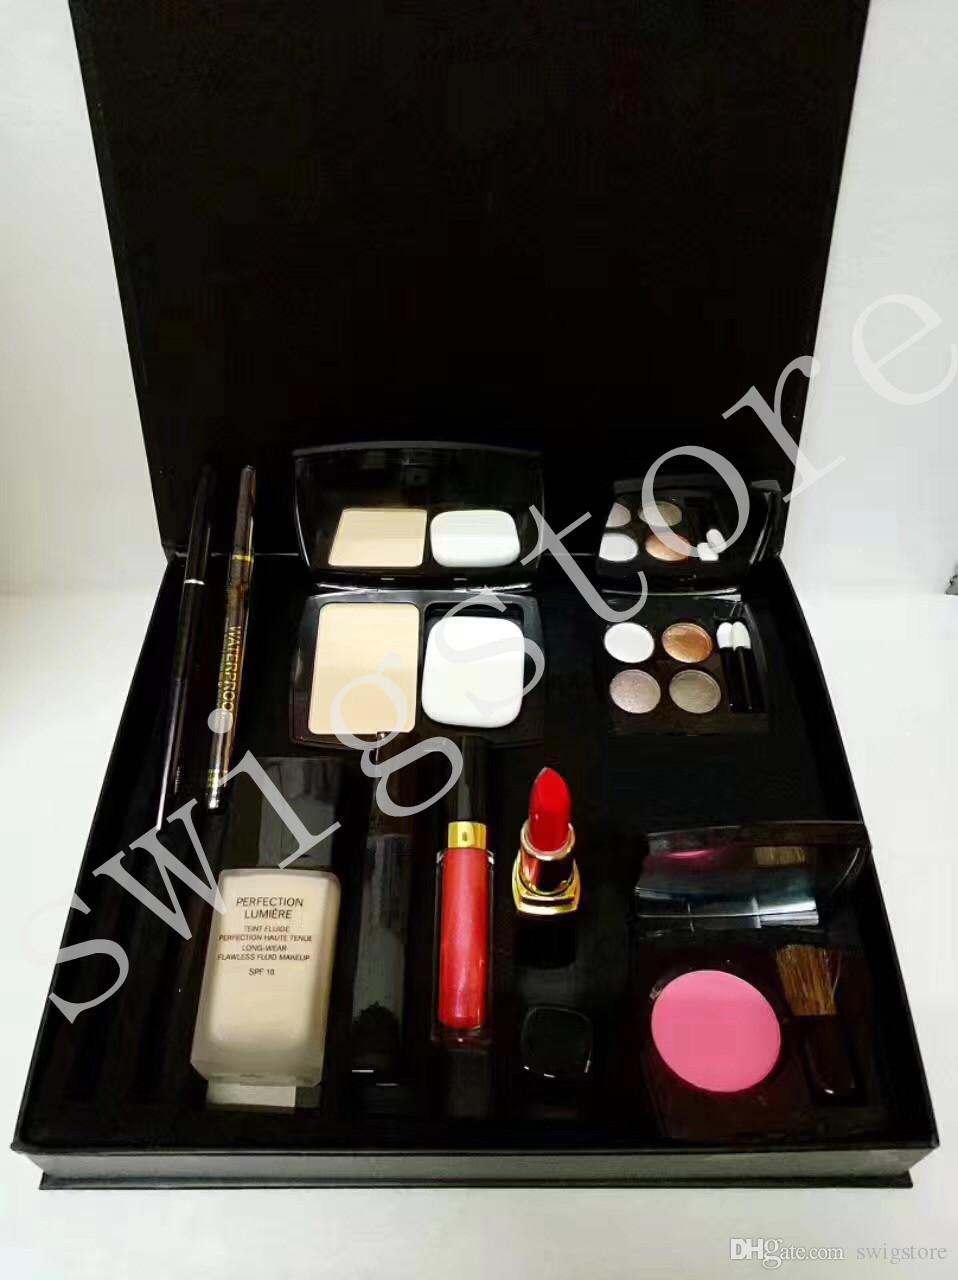 2018 9pcs cosmetics set concealer eyebrow pencil blush lipstick eyeliner pencil high quality makeup kit big box with free gift box